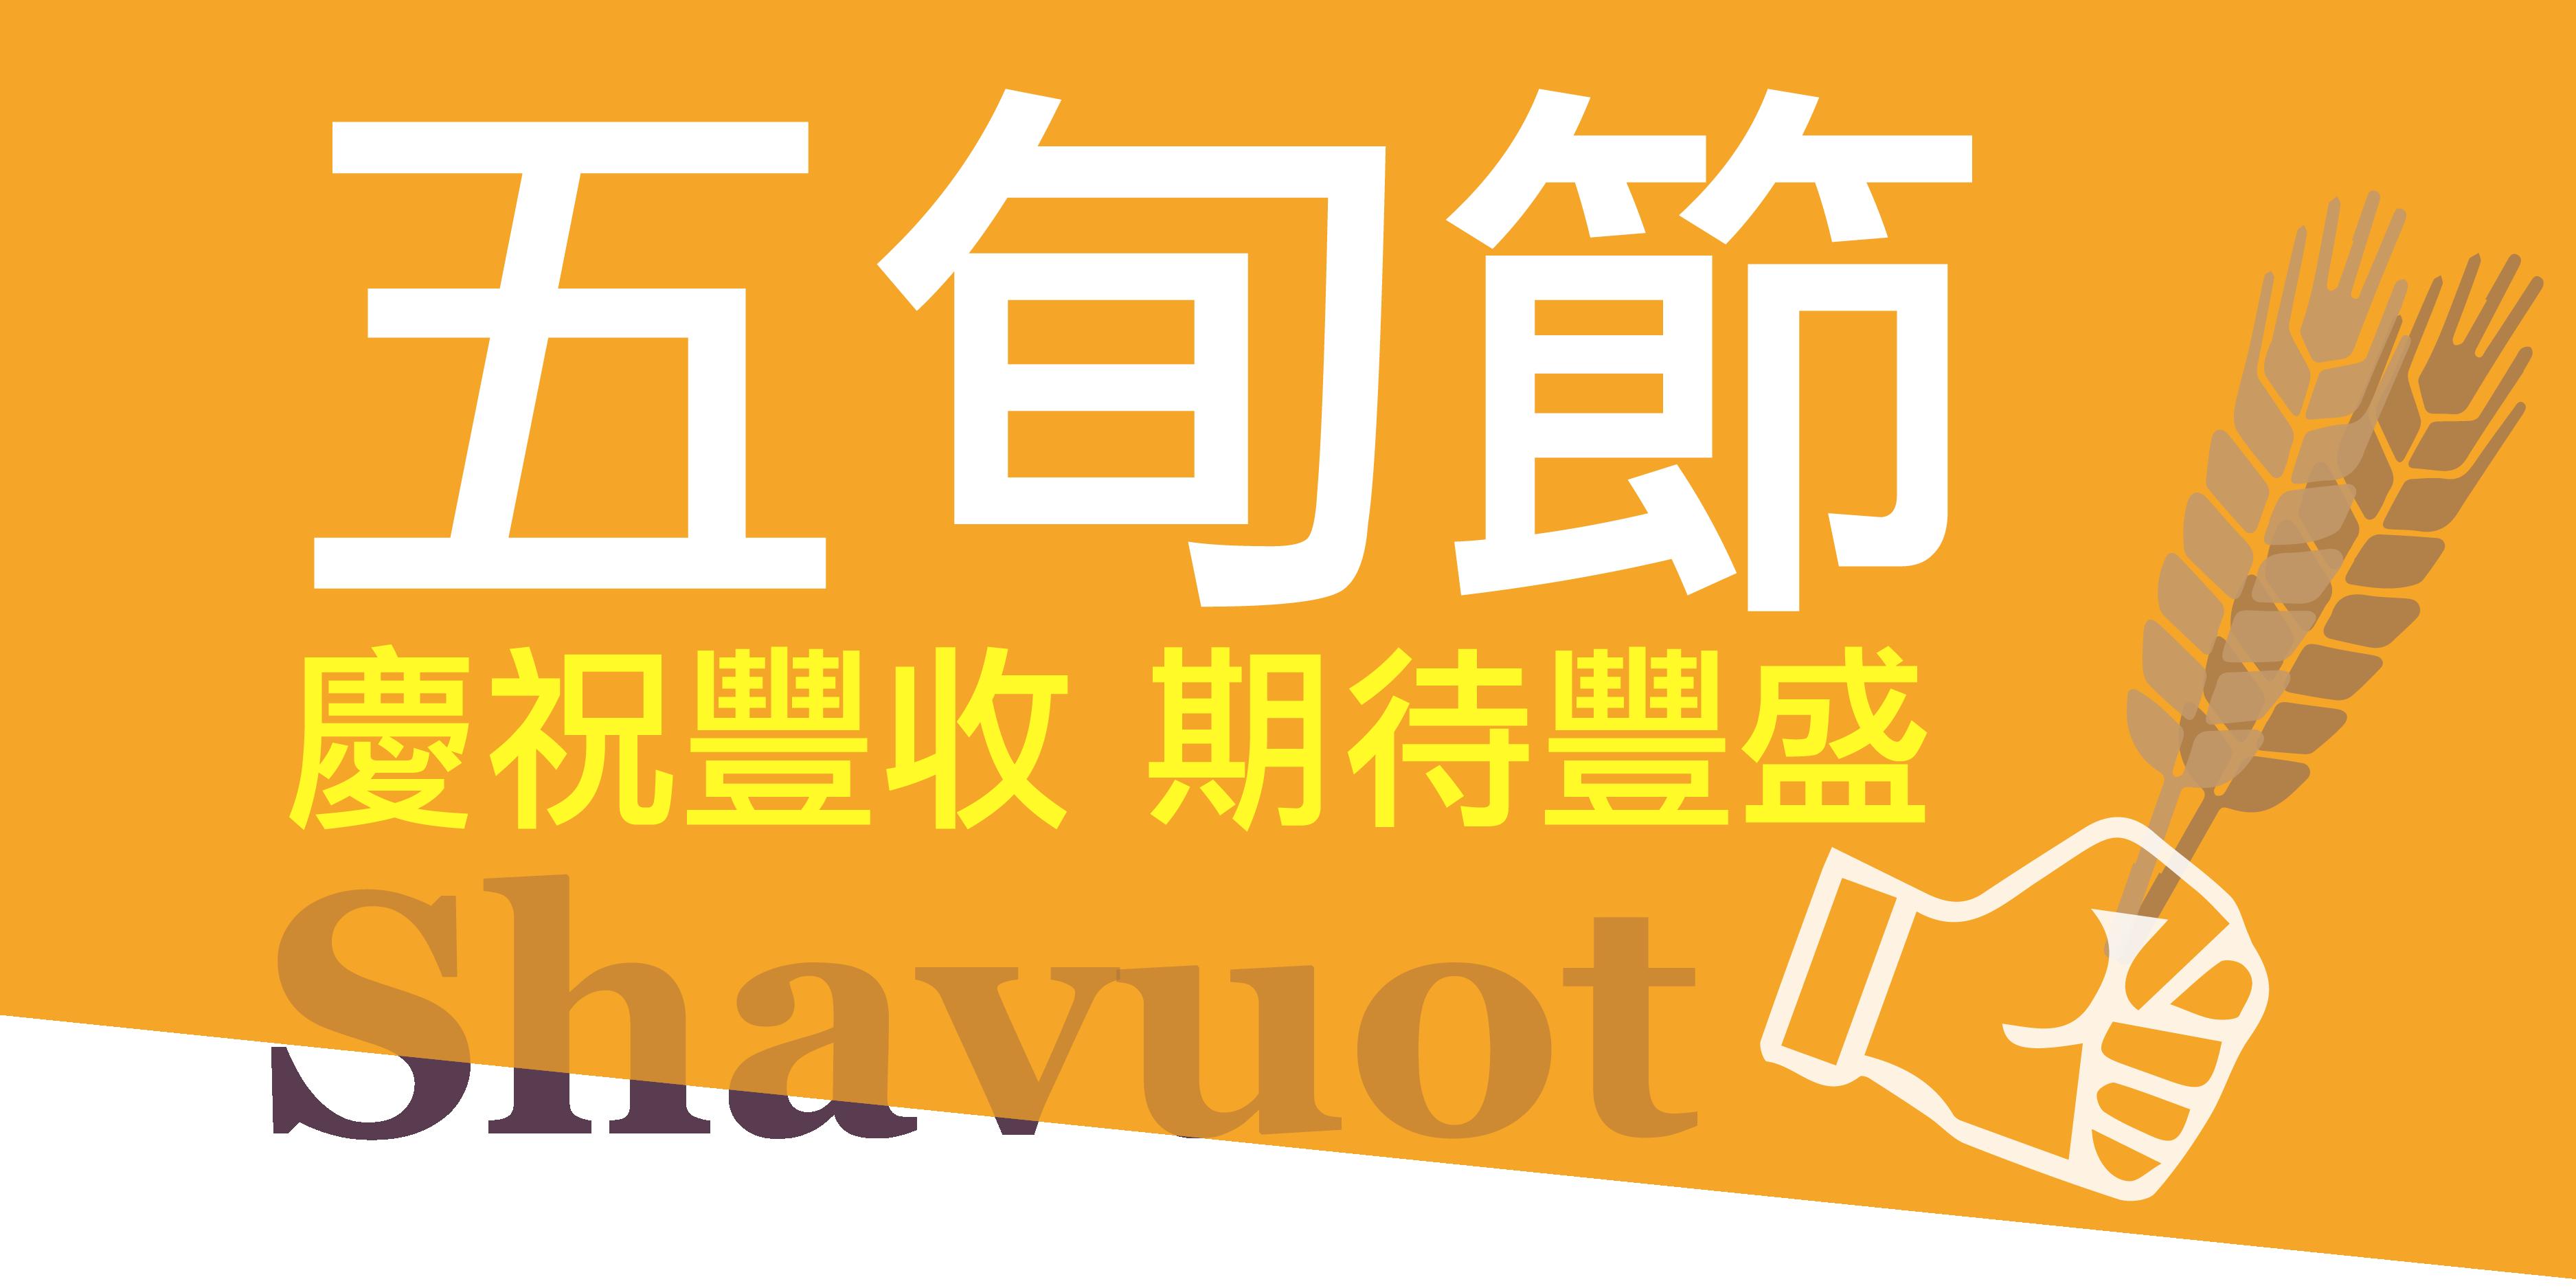 國度1分鐘(30) – 五旬節/七七節(Pentecost/Shavuot)